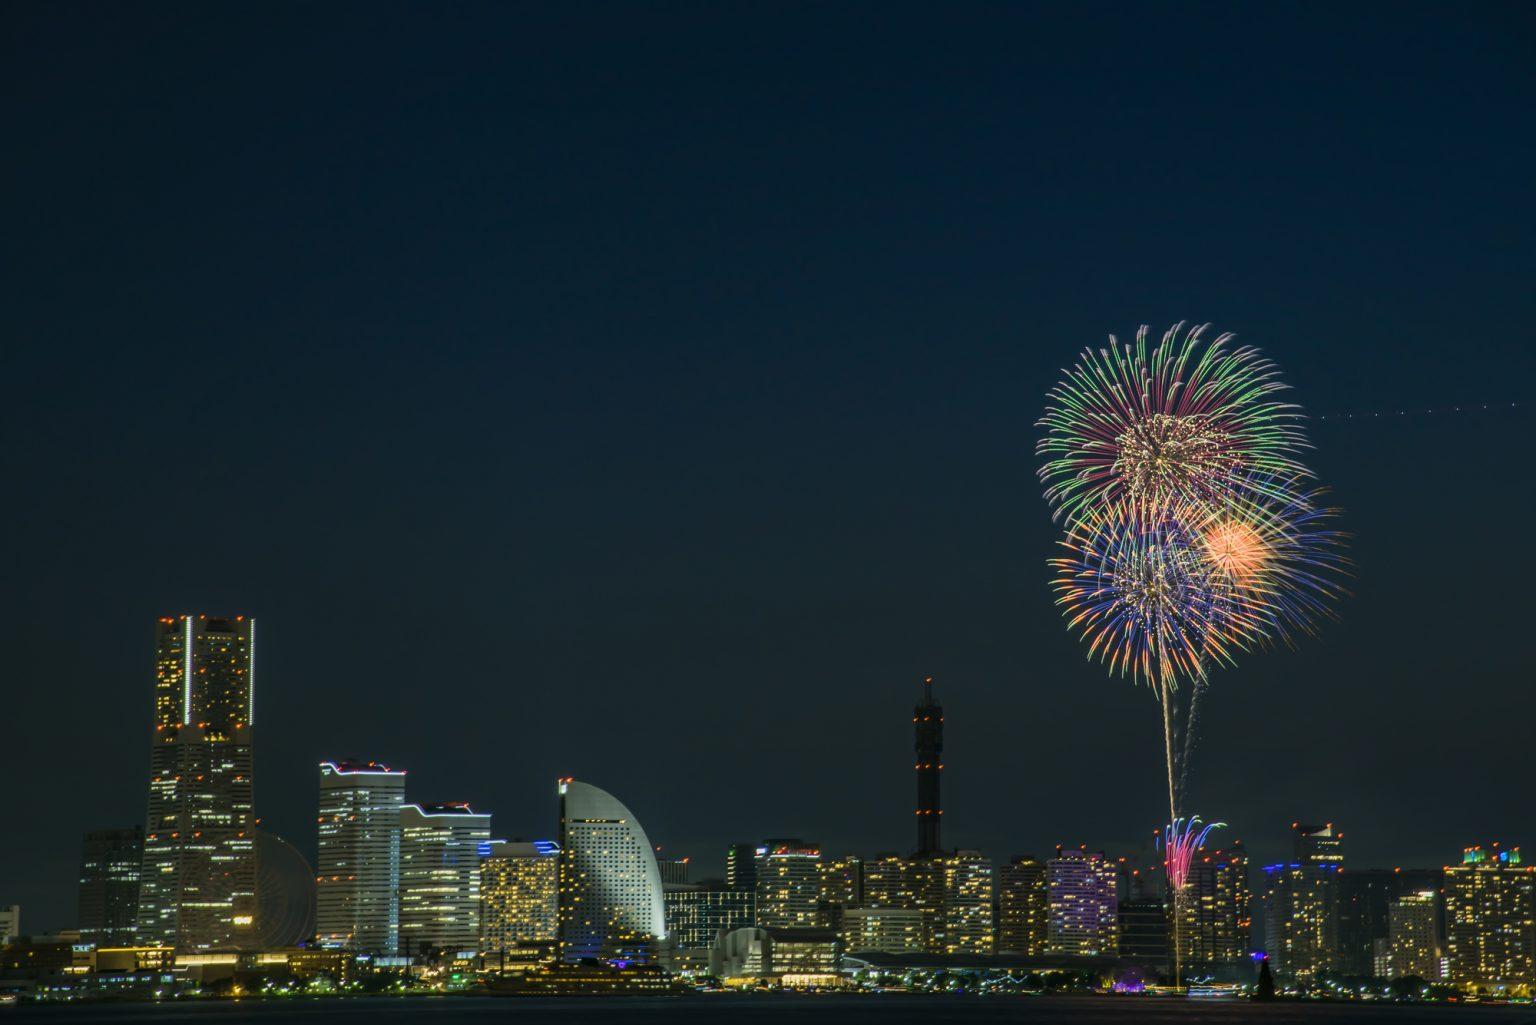 横浜開港祭の花火風景